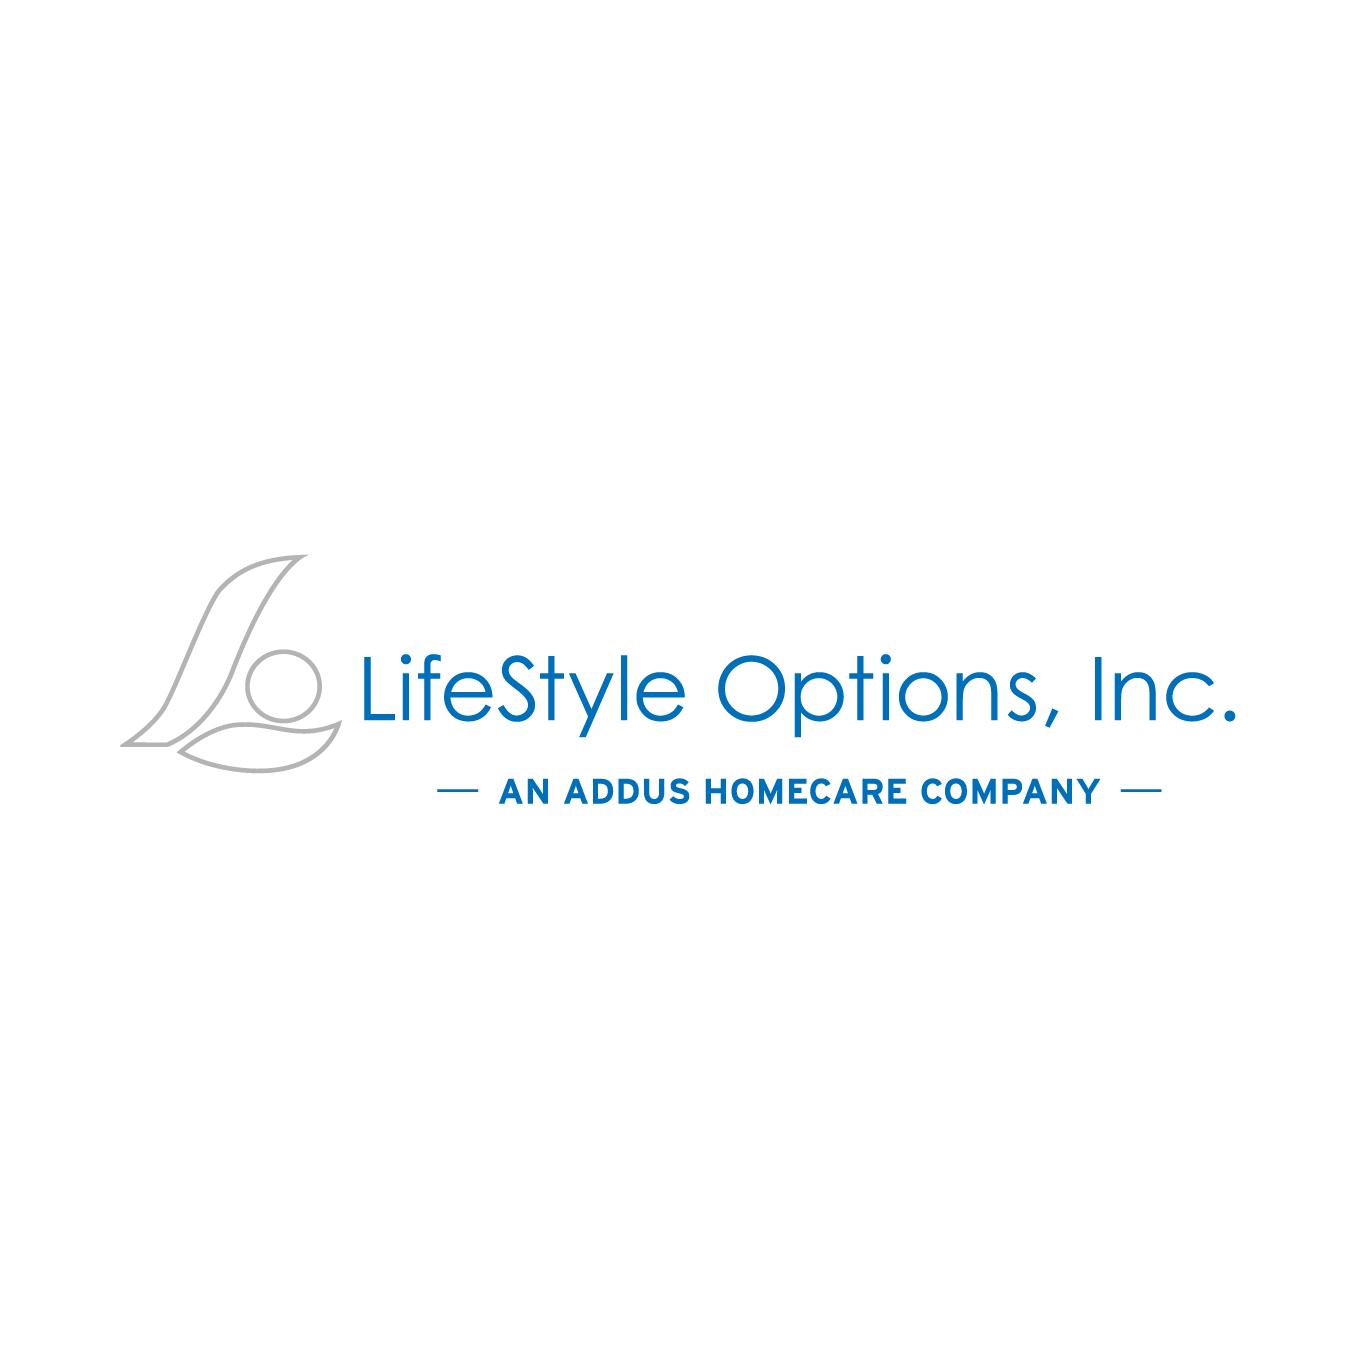 LifeStyle Options